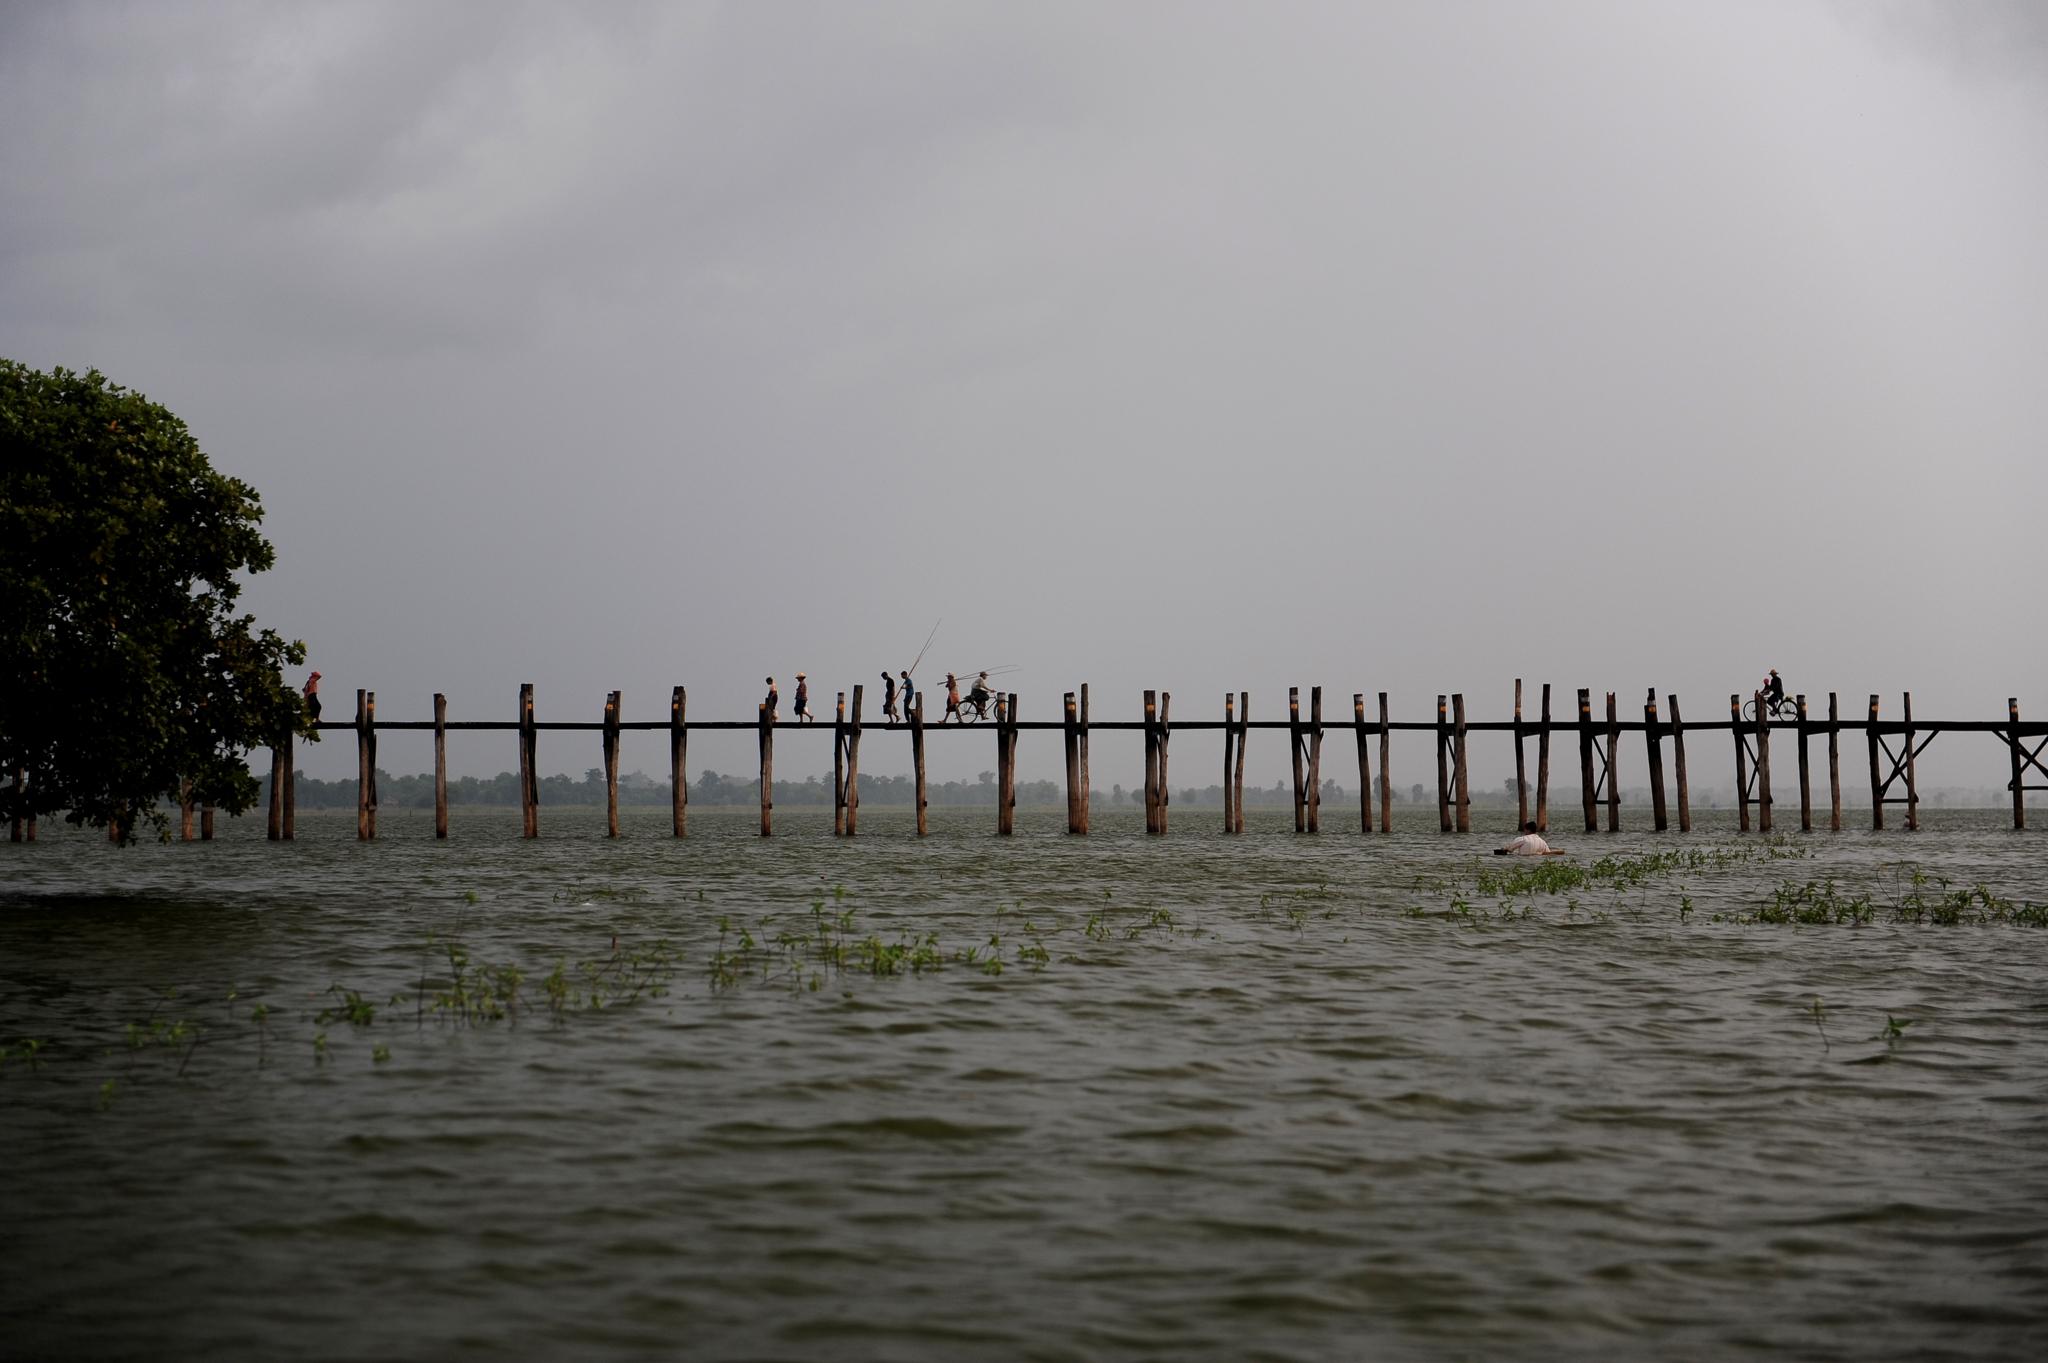 Foot bridge in Myanamr